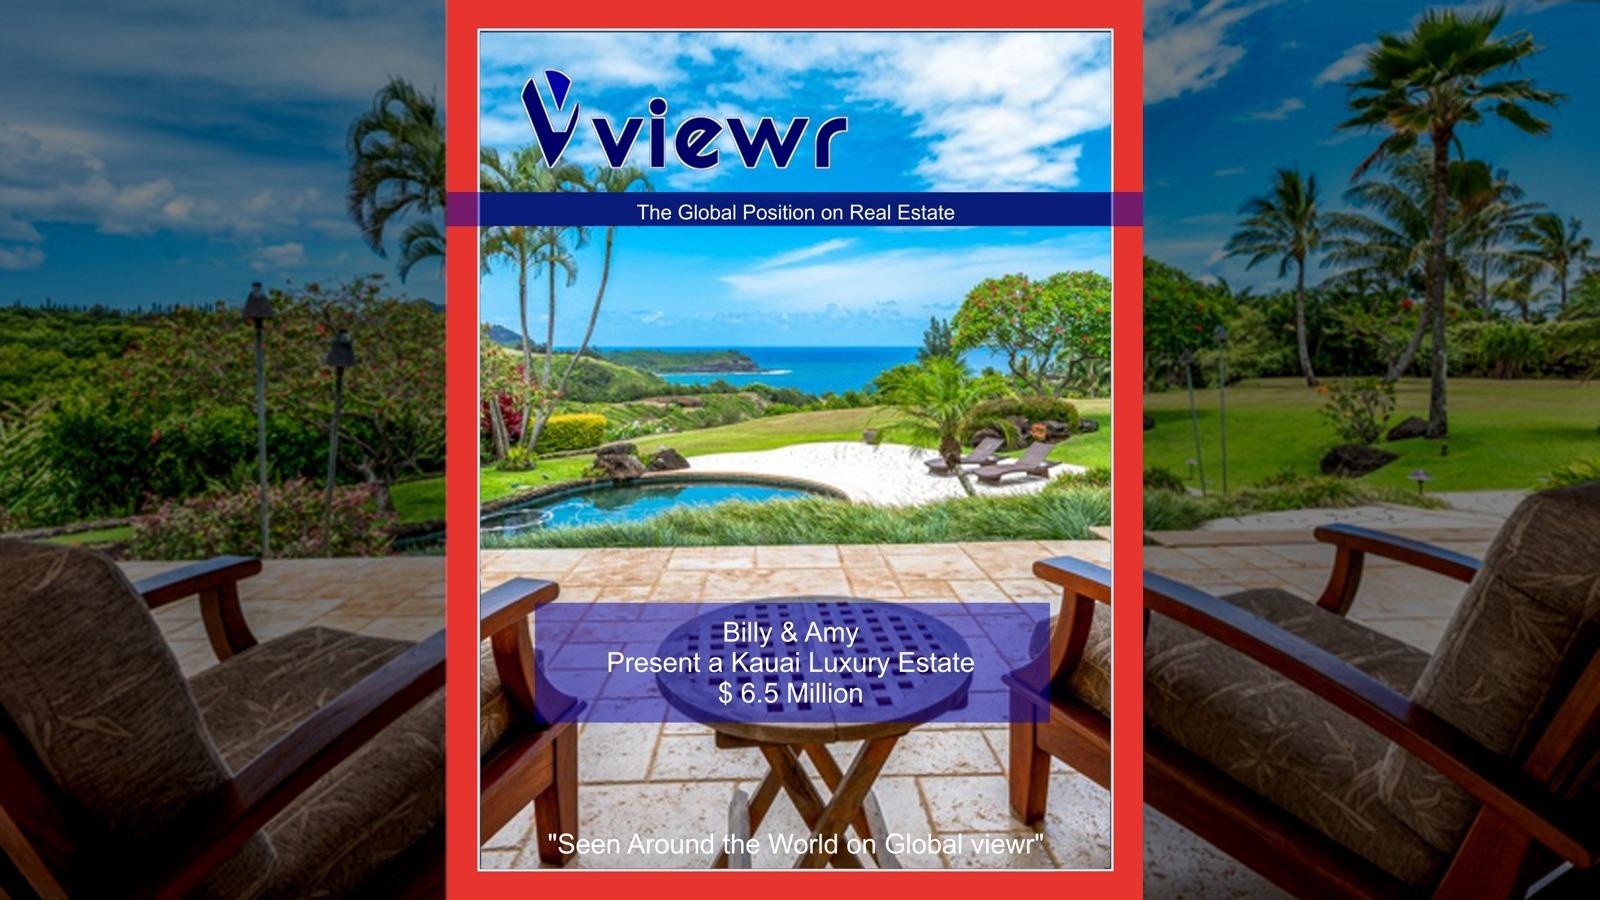 Billy and Amy Kauai Hawaii Real Estate on Global viewr Magazine